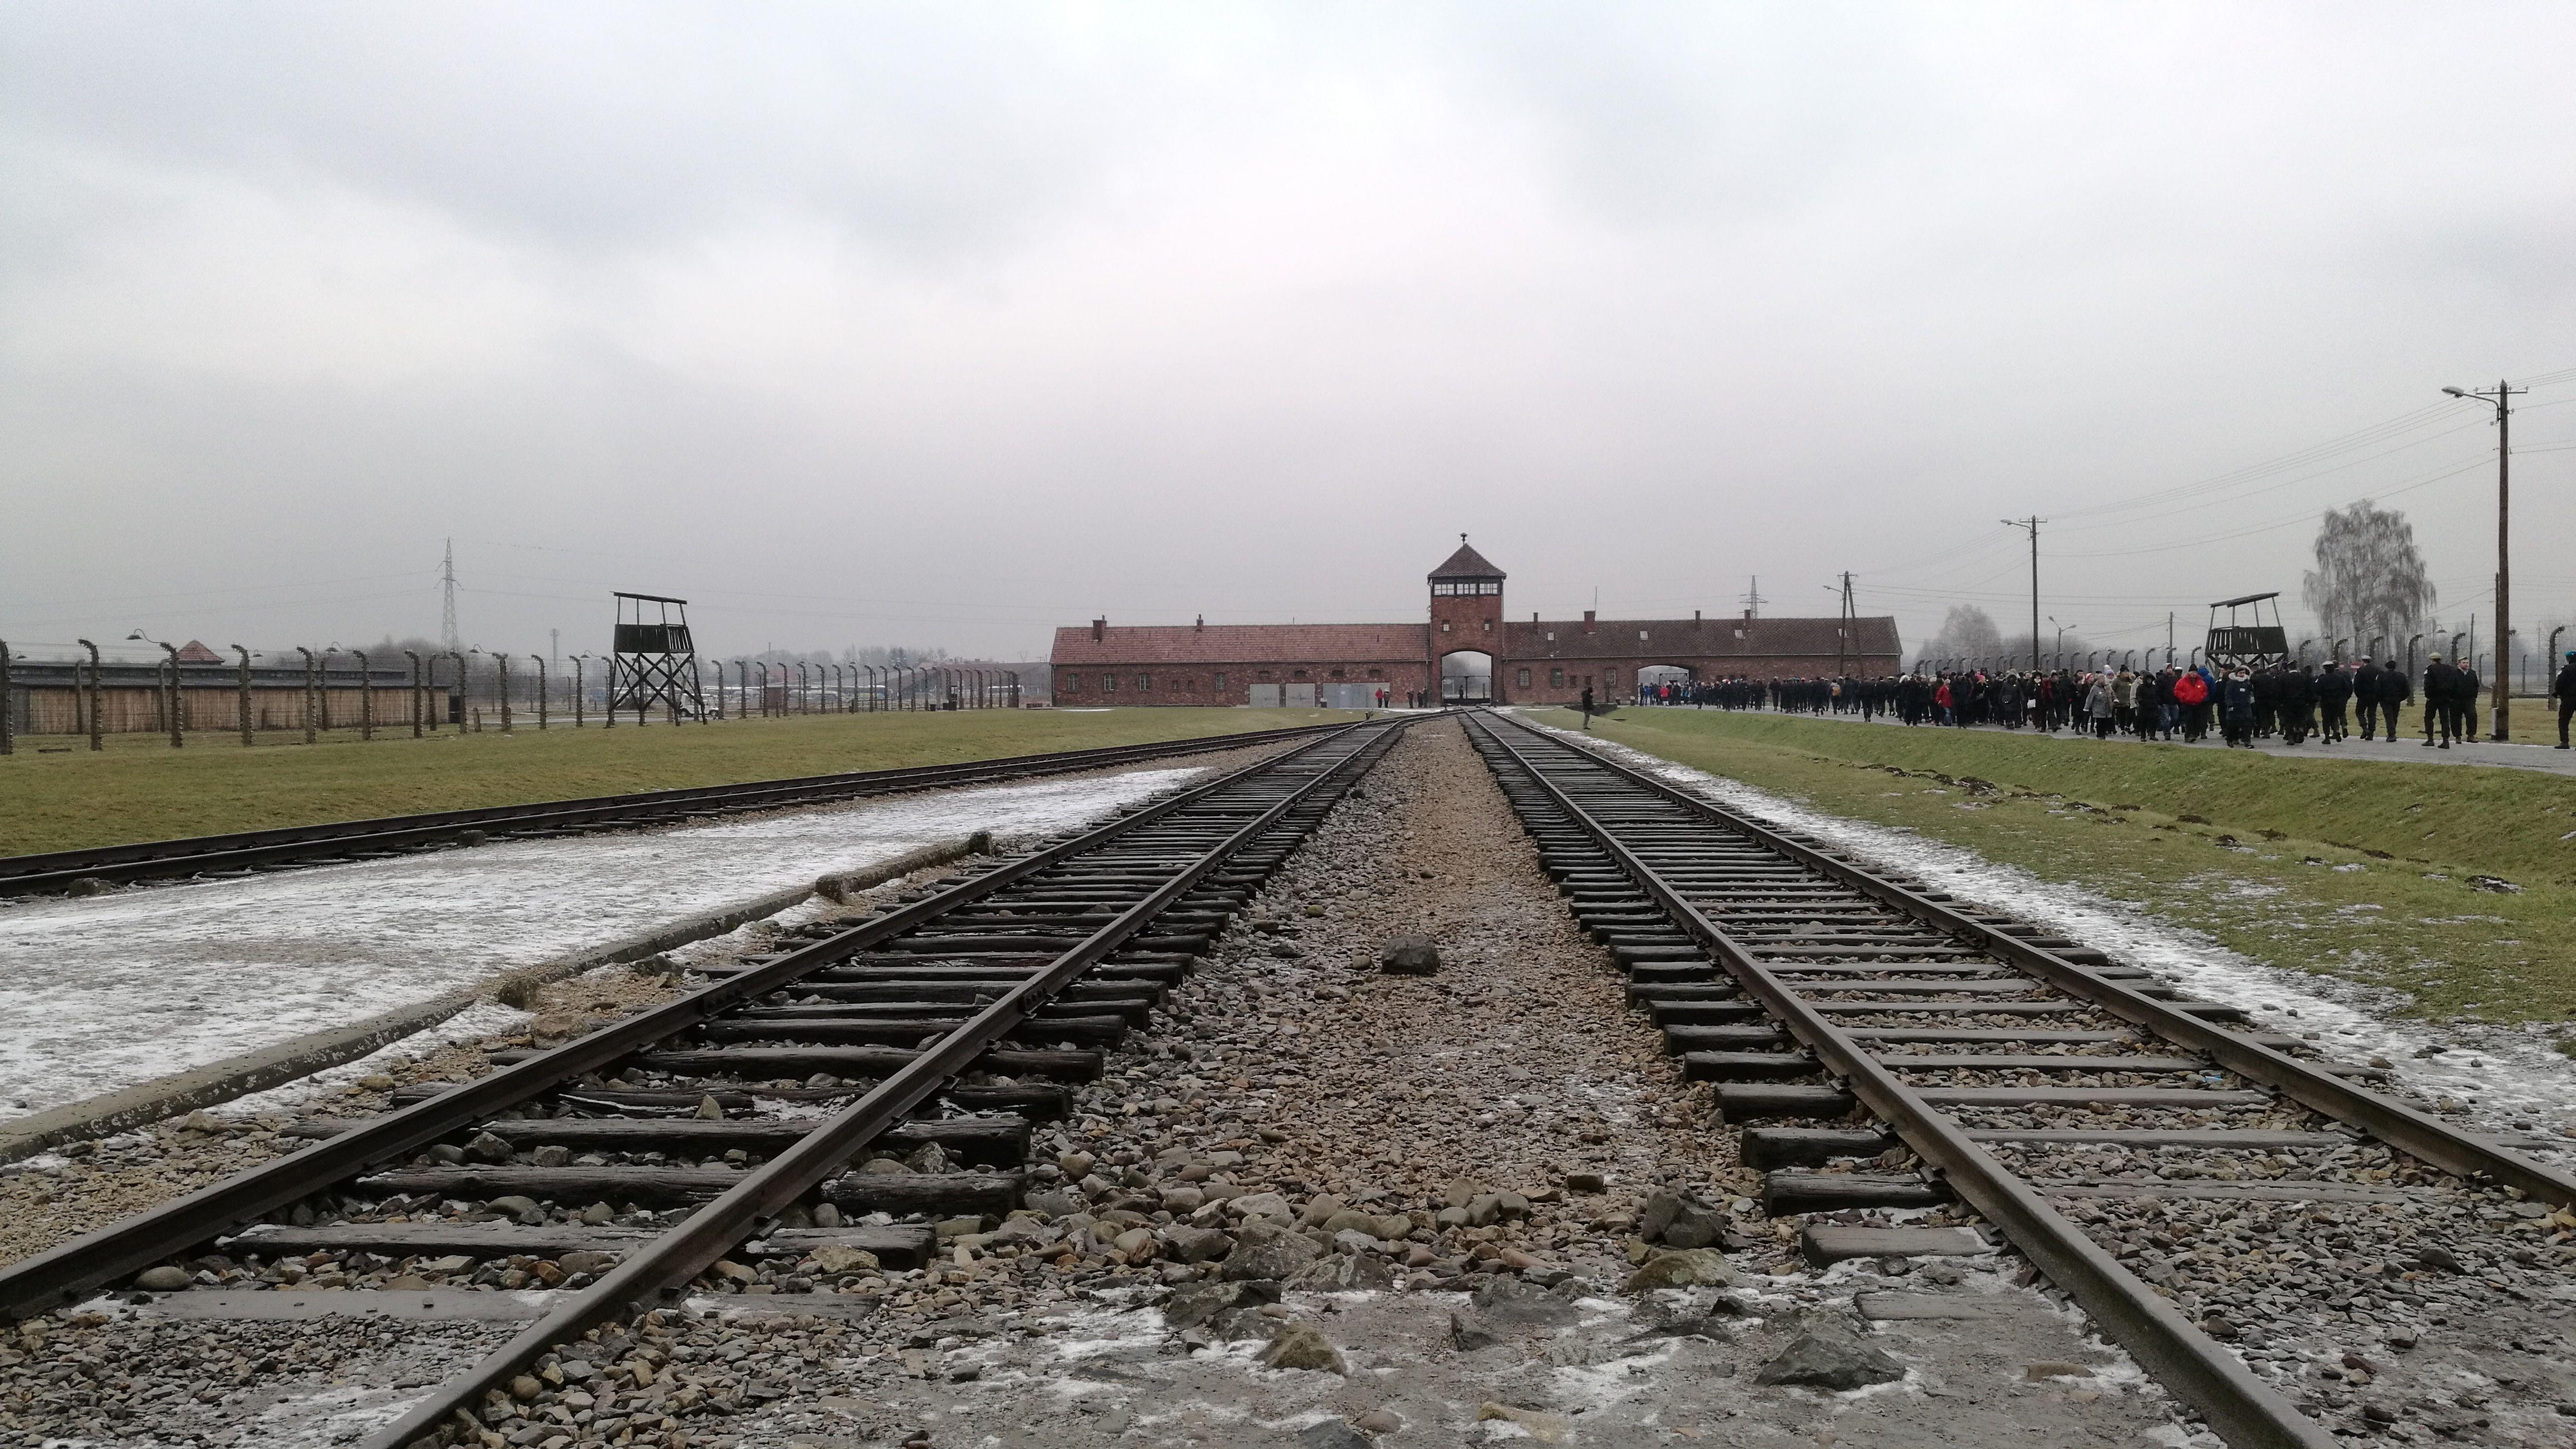 Las vias entrando a Auswitch-Birkenau